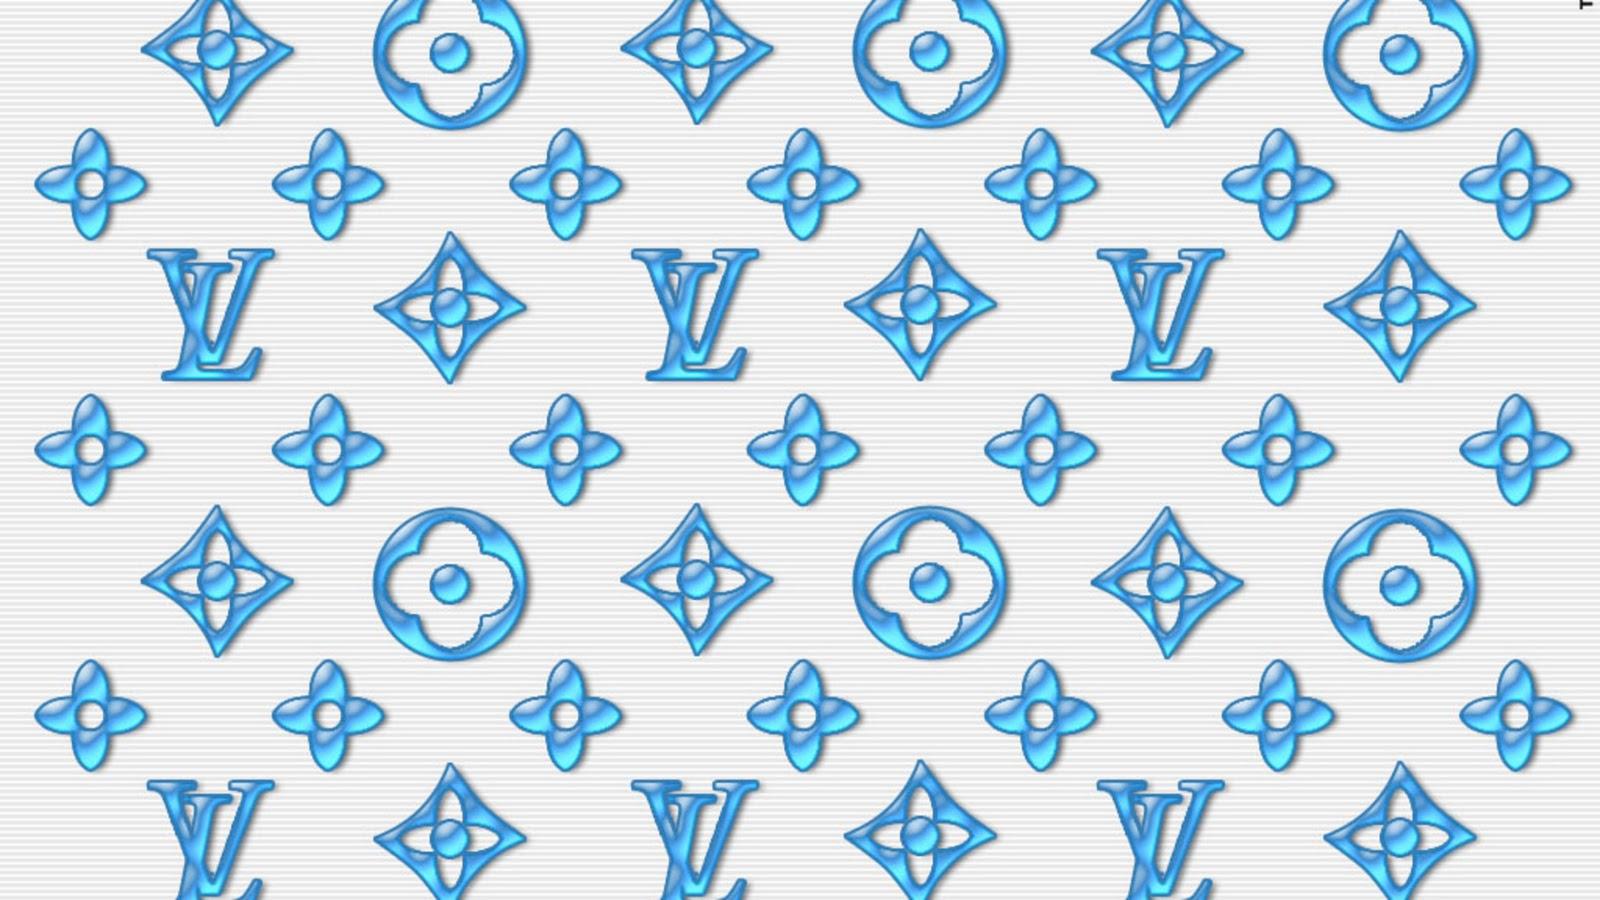 Free Download Wallpapers Full Hd Louis Vuitton Full Hd Desktop Wallpapers 1600x900 For Your Desktop Mobile Tablet Explore 38 Louis Vuitton Computer Wallpaper Louis Vuitton Wallpapers Hd Louis Vuitton